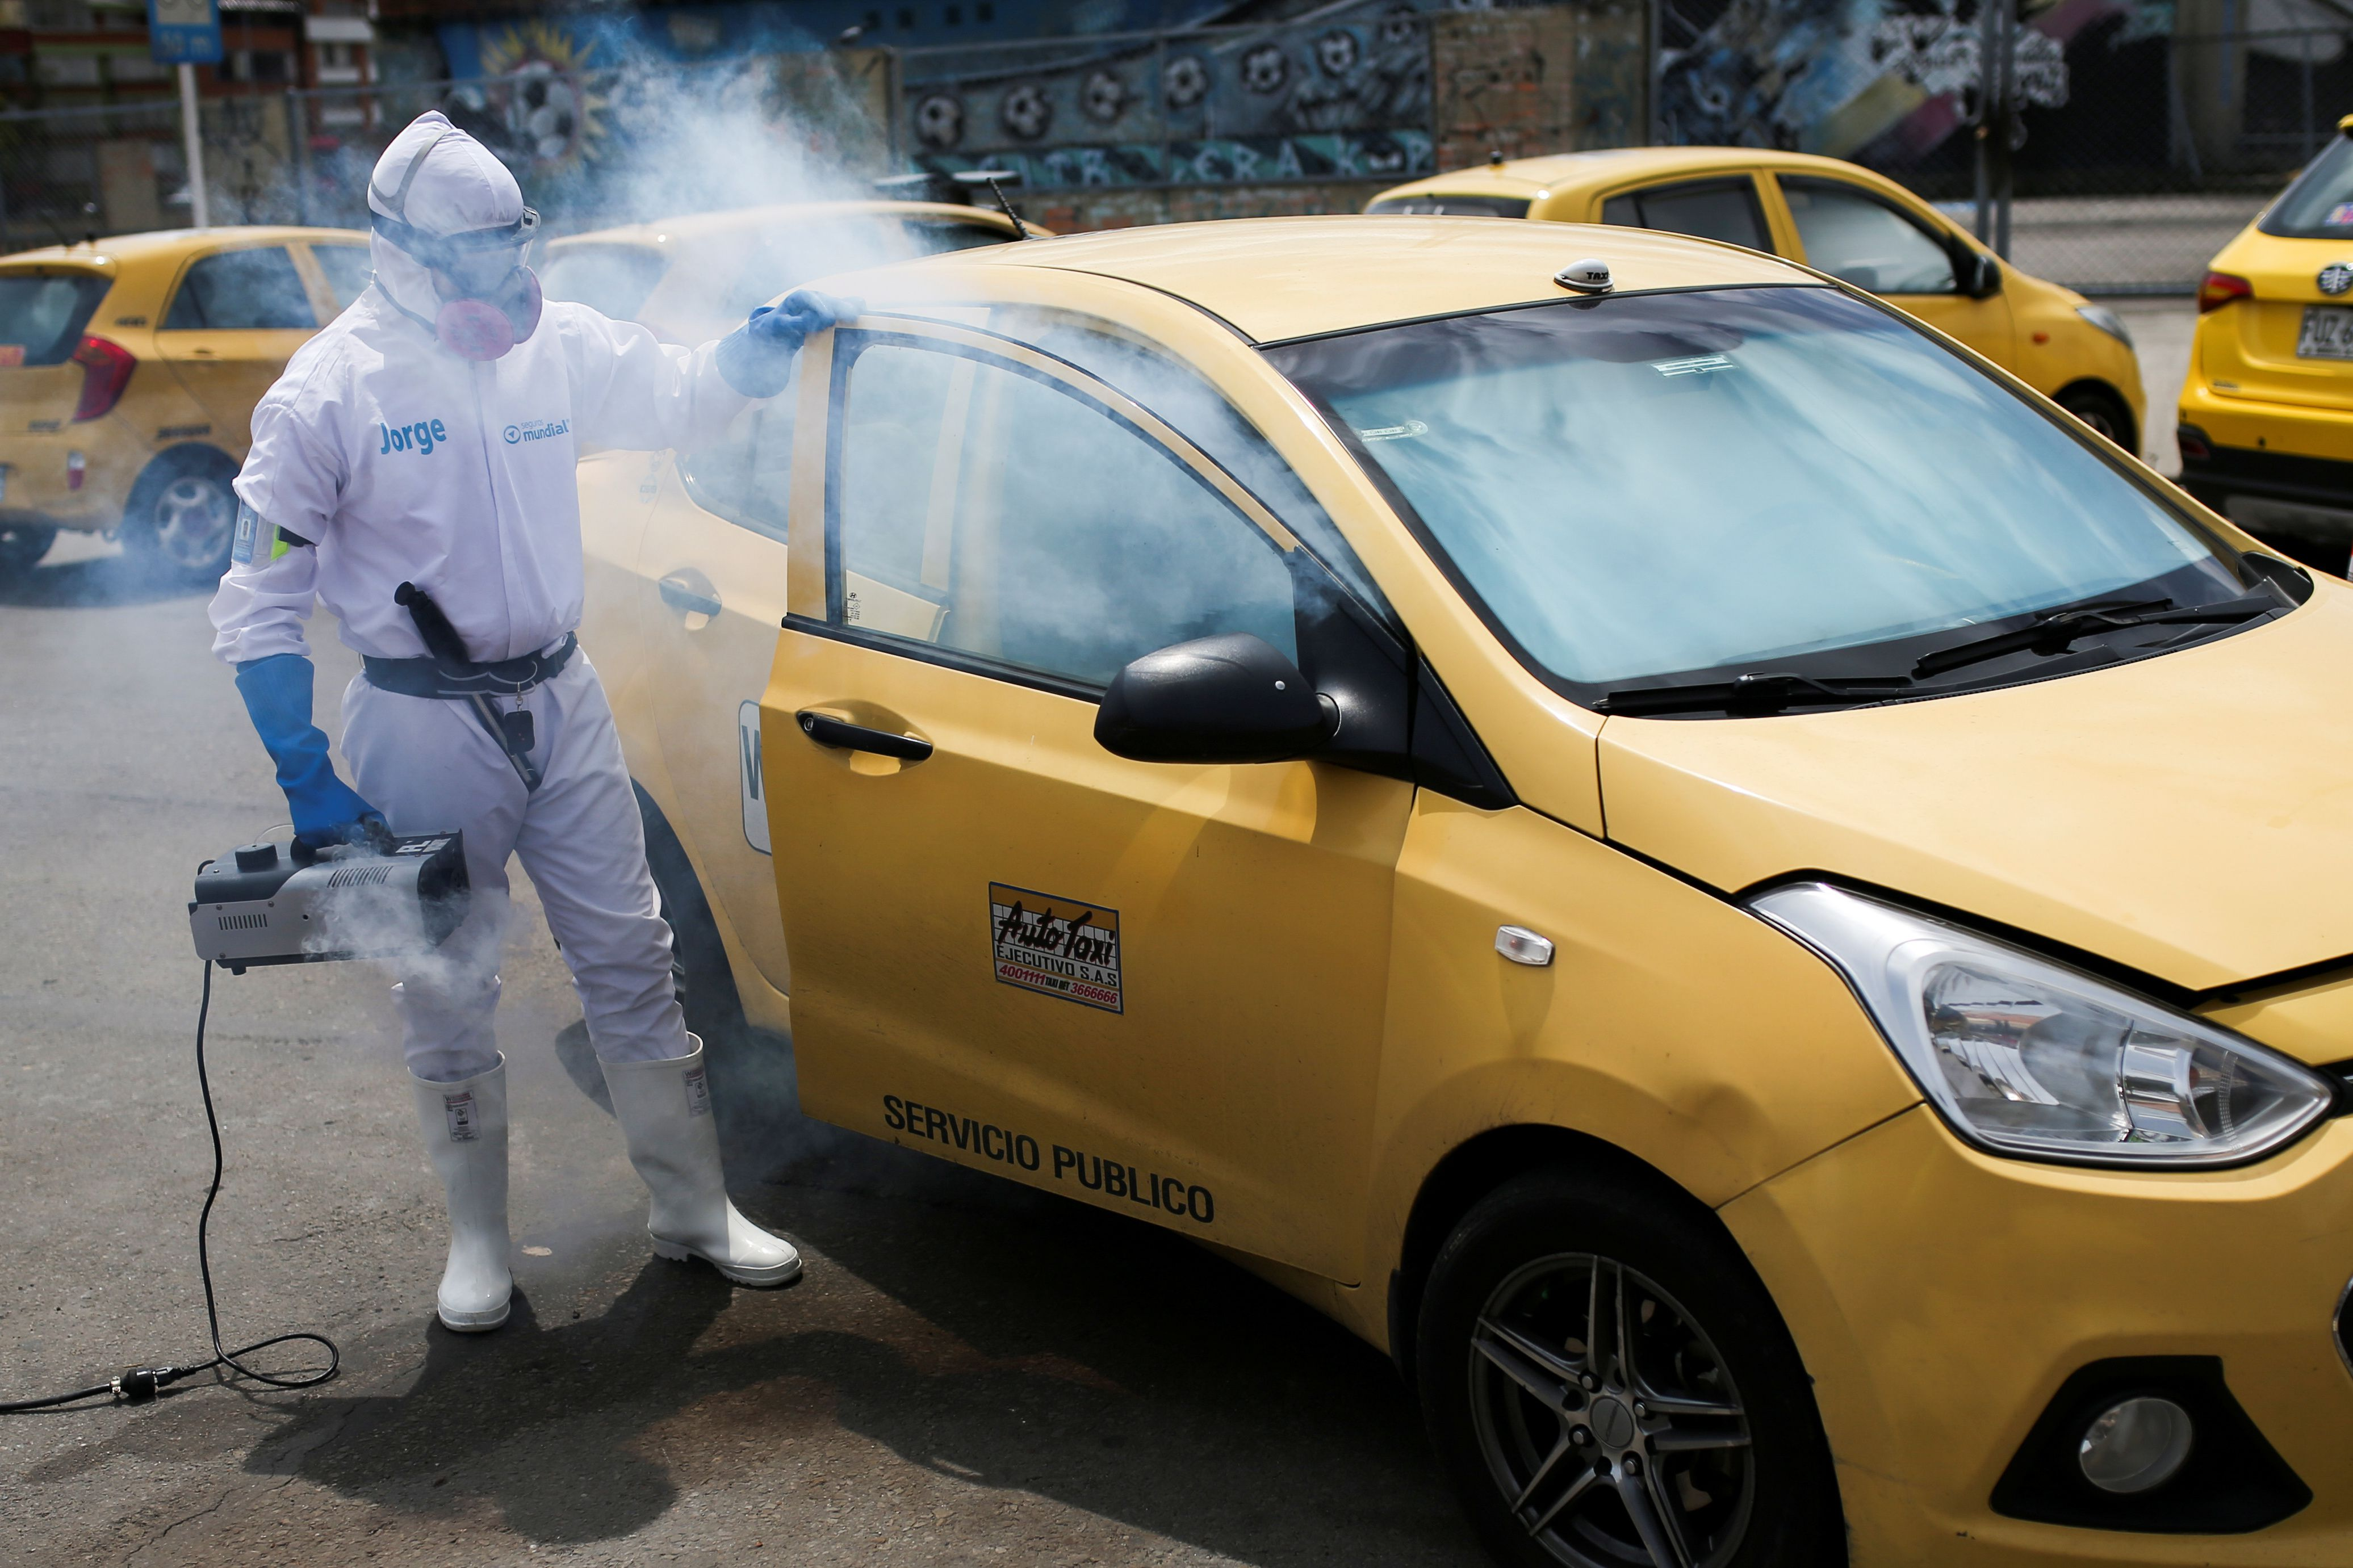 Limpieza profunda a un taxi en Bogotá, Colombia (REUTERS/Luisa González)